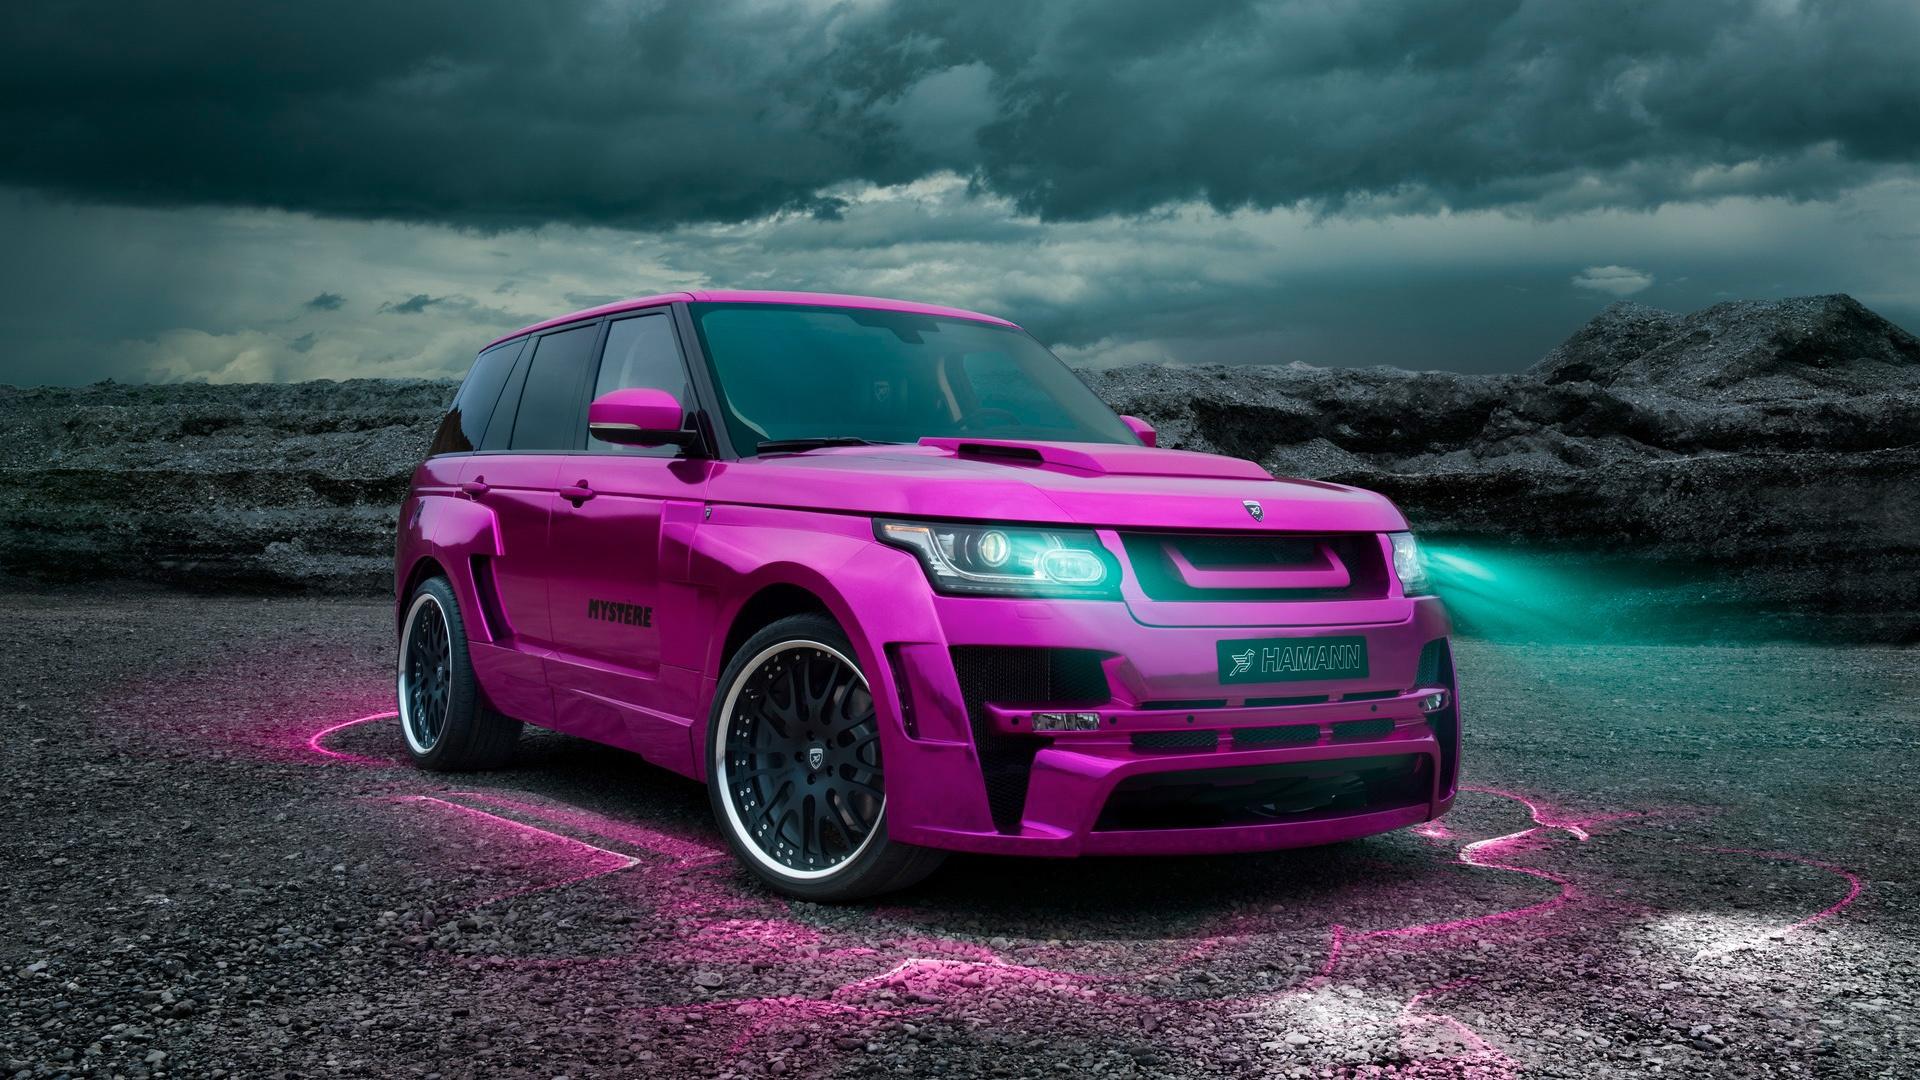 Hamman Range Rover